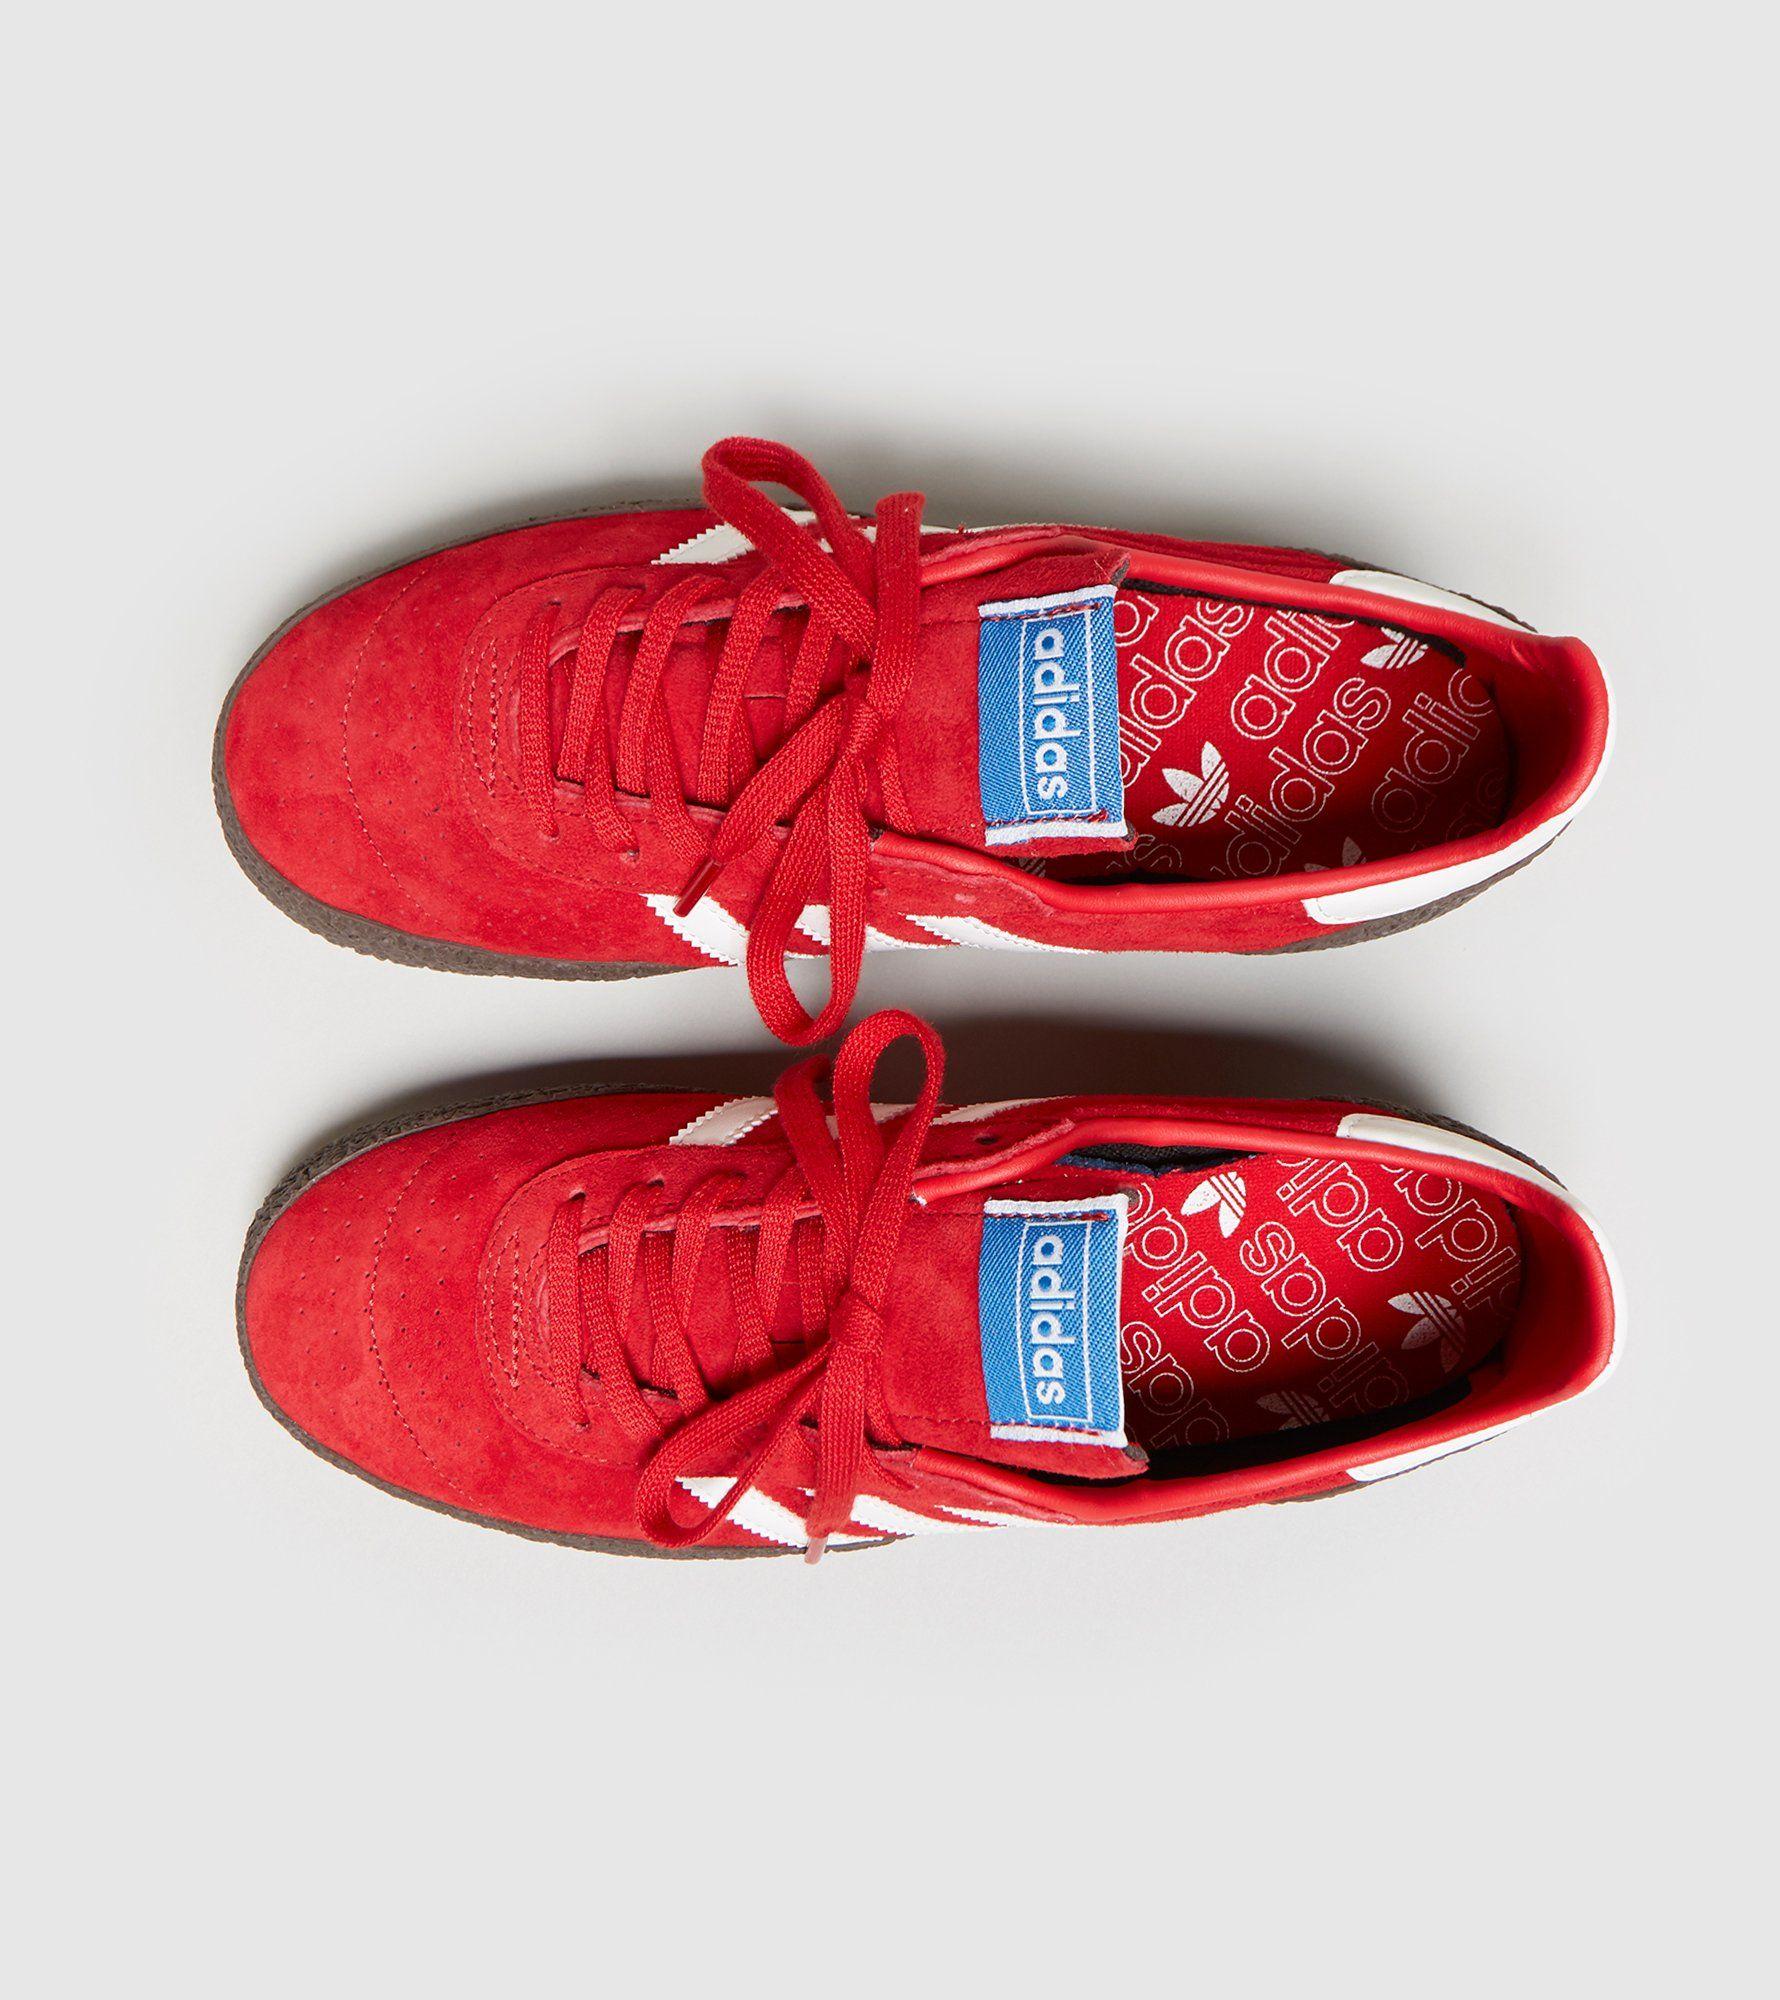 adidas Originals Montreal 76 - size? Exclusive Women's